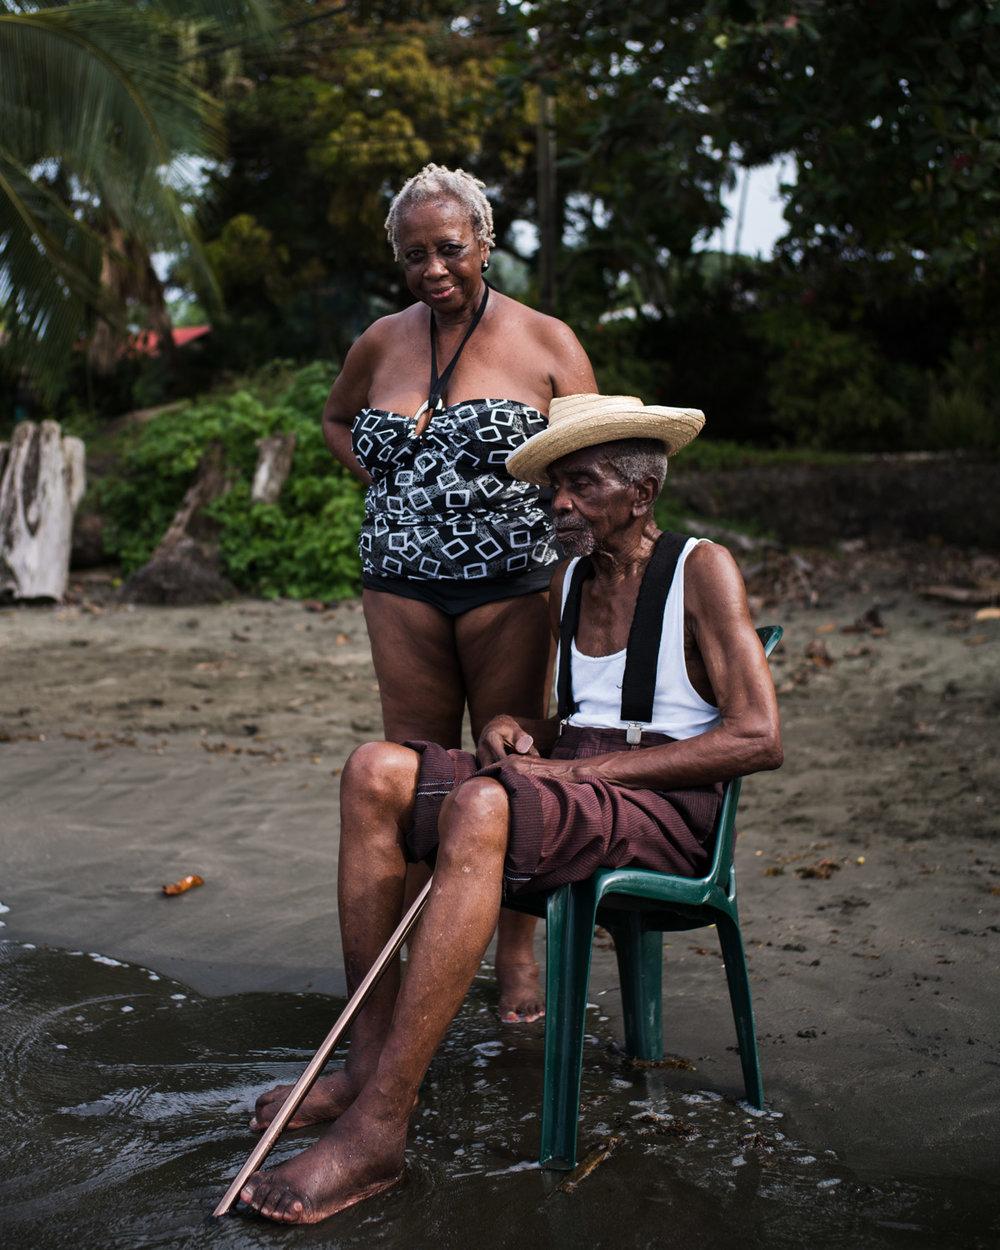 costa-rica-banana-trade-7356.jpg